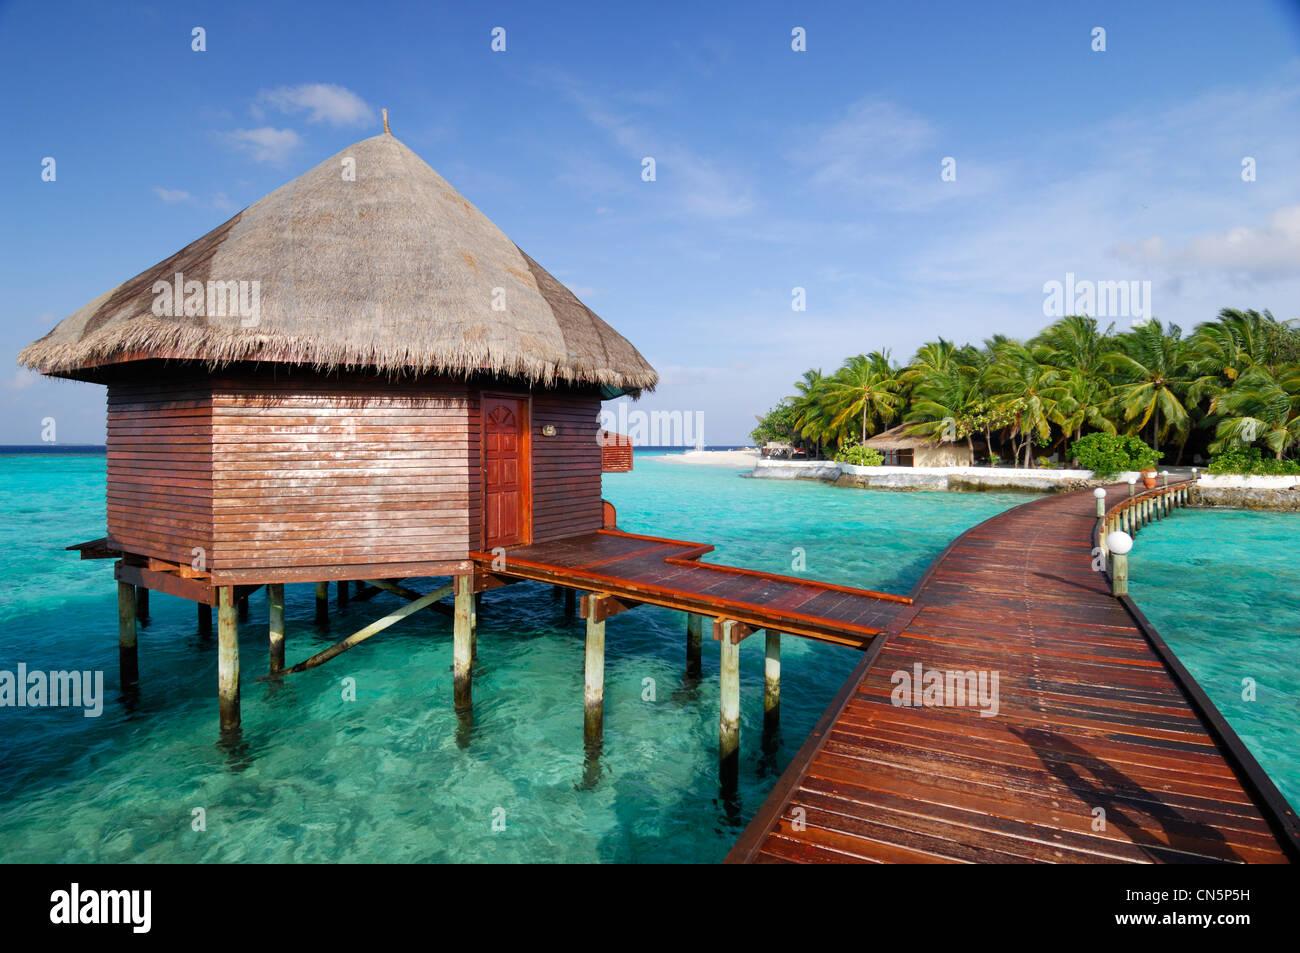 Maldives North Male Atoll Thulhagiri Island Thulhagiri